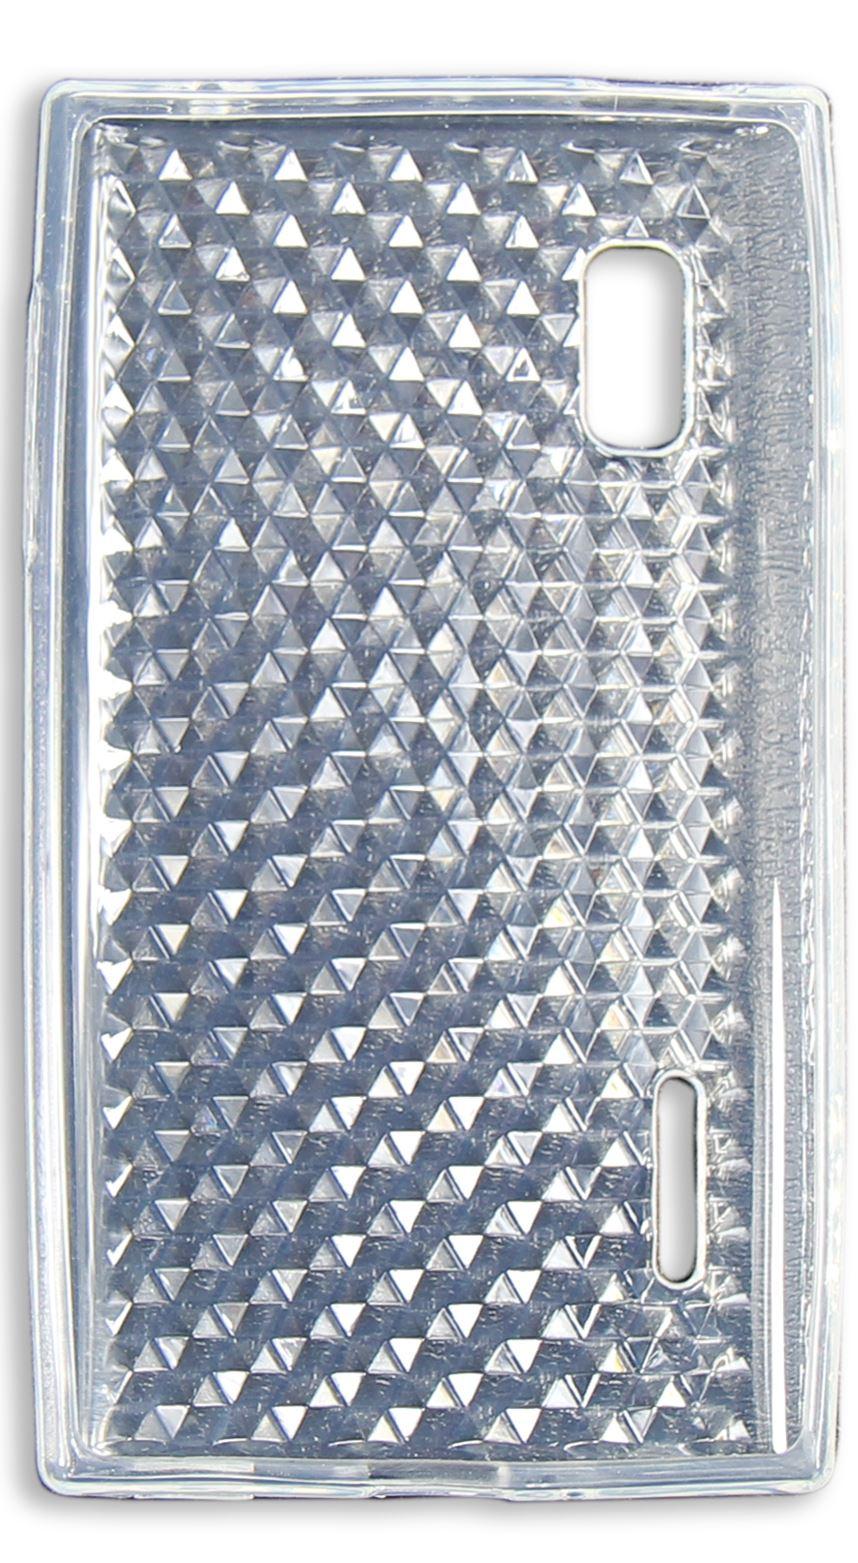 Coque-Housse-Etui-en-Silicone-TPU-Polycarbonate-Cuir-pour-LG-Optimus-E610